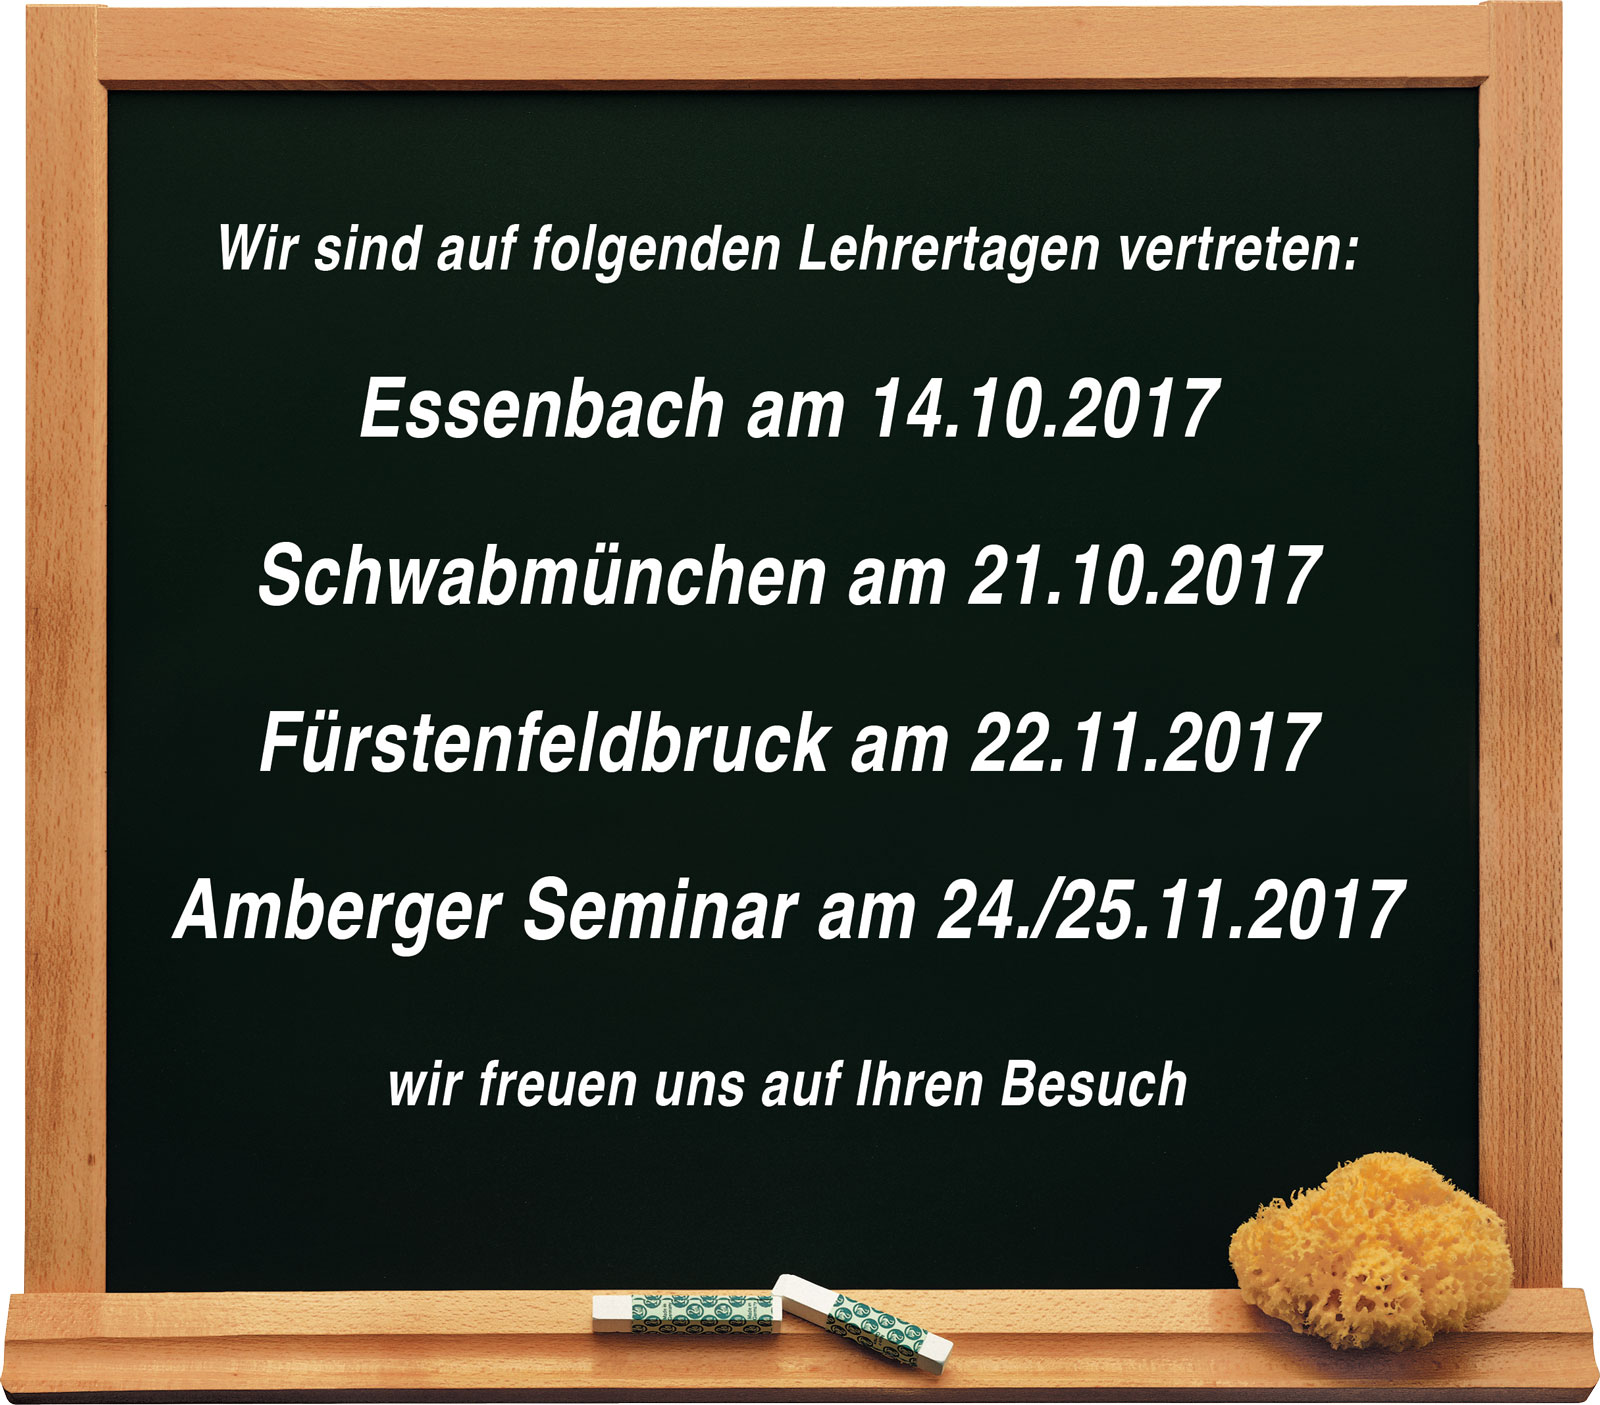 Braun_Schulbedarf_Lehrertage_2017